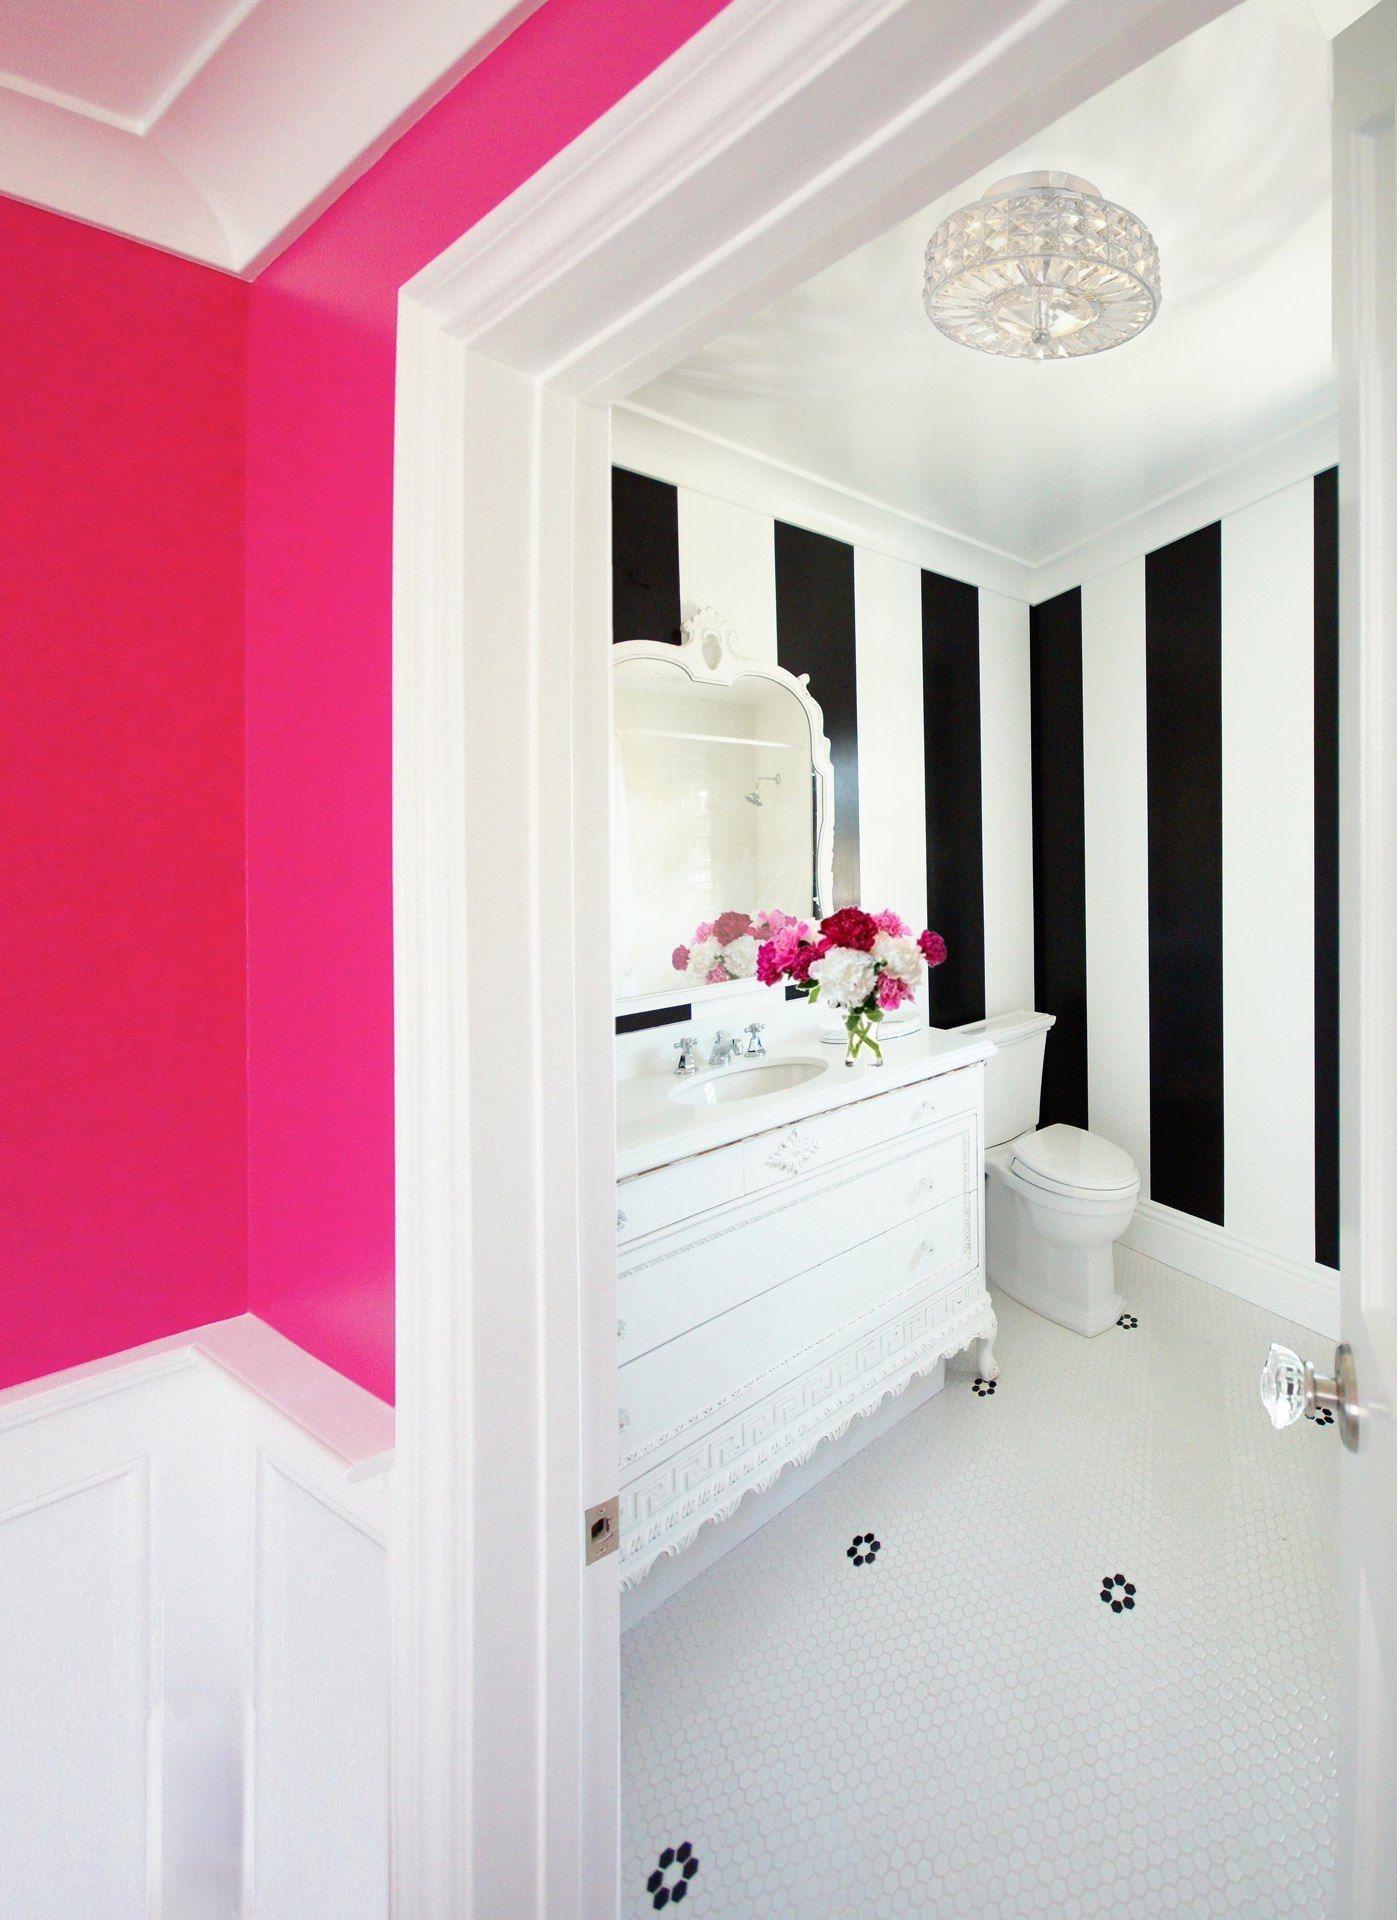 Black White Pink Beautiful My New Bathroom Palette I Think So Girly Bathroom Pink Ceiling Bathroom Interior Design